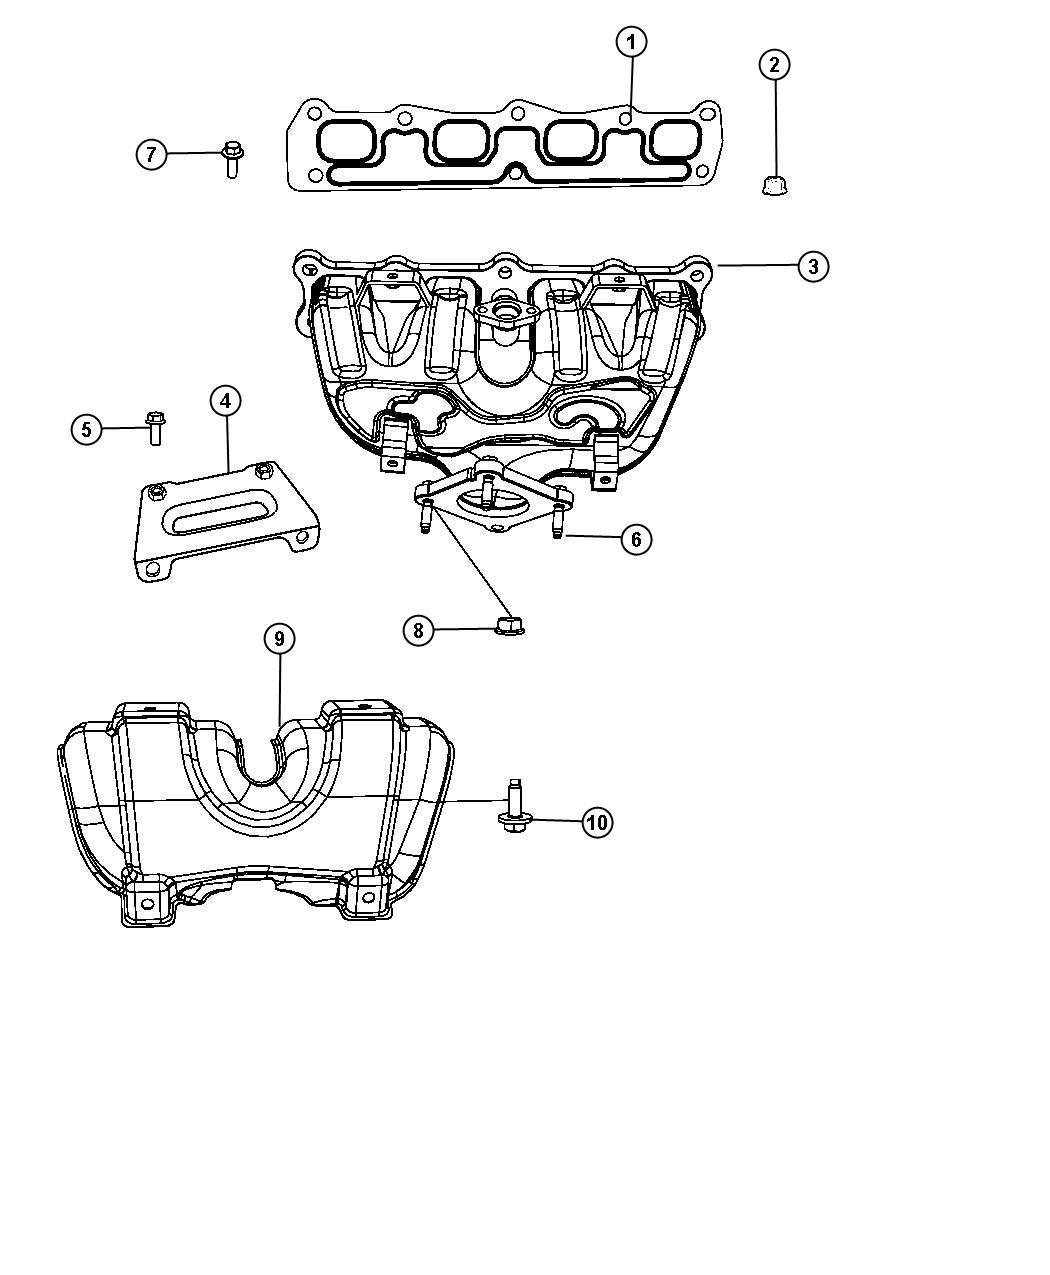 2007 dodge caliber starter wiring diagram york air conditioner 2008 jeep patriot 2 4l imageresizertool com